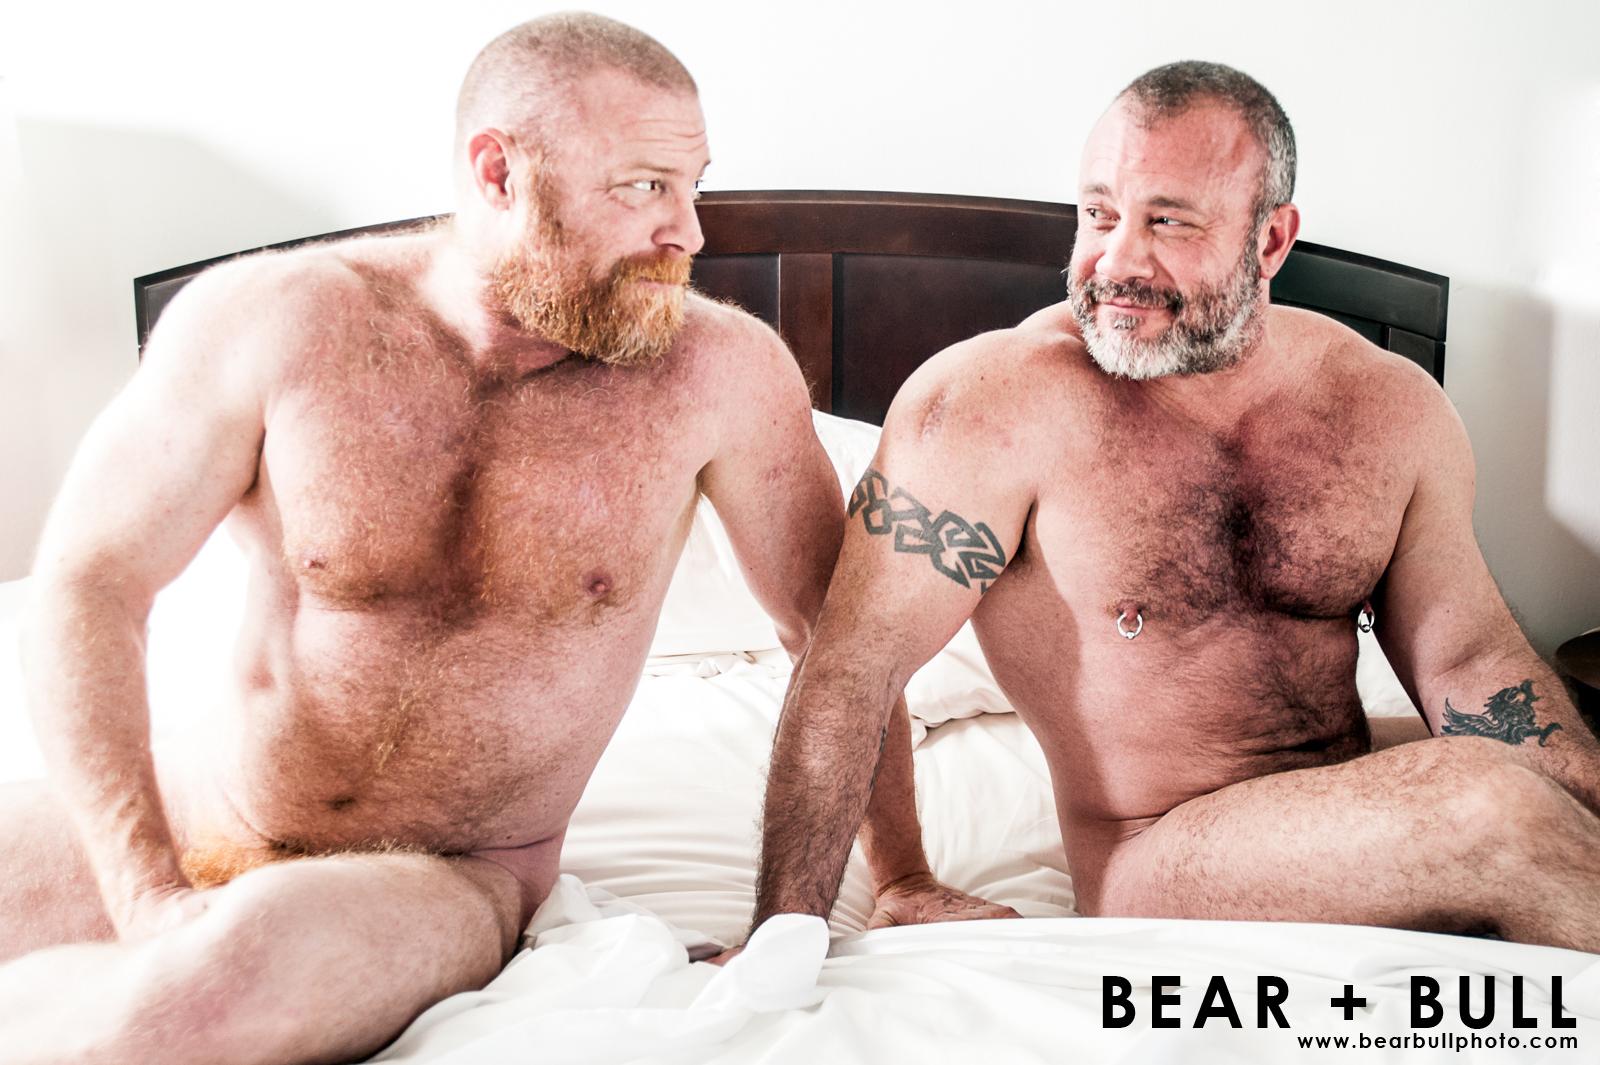 Wallpaper : portrait, bed, muscles, couple, bears, beards ...